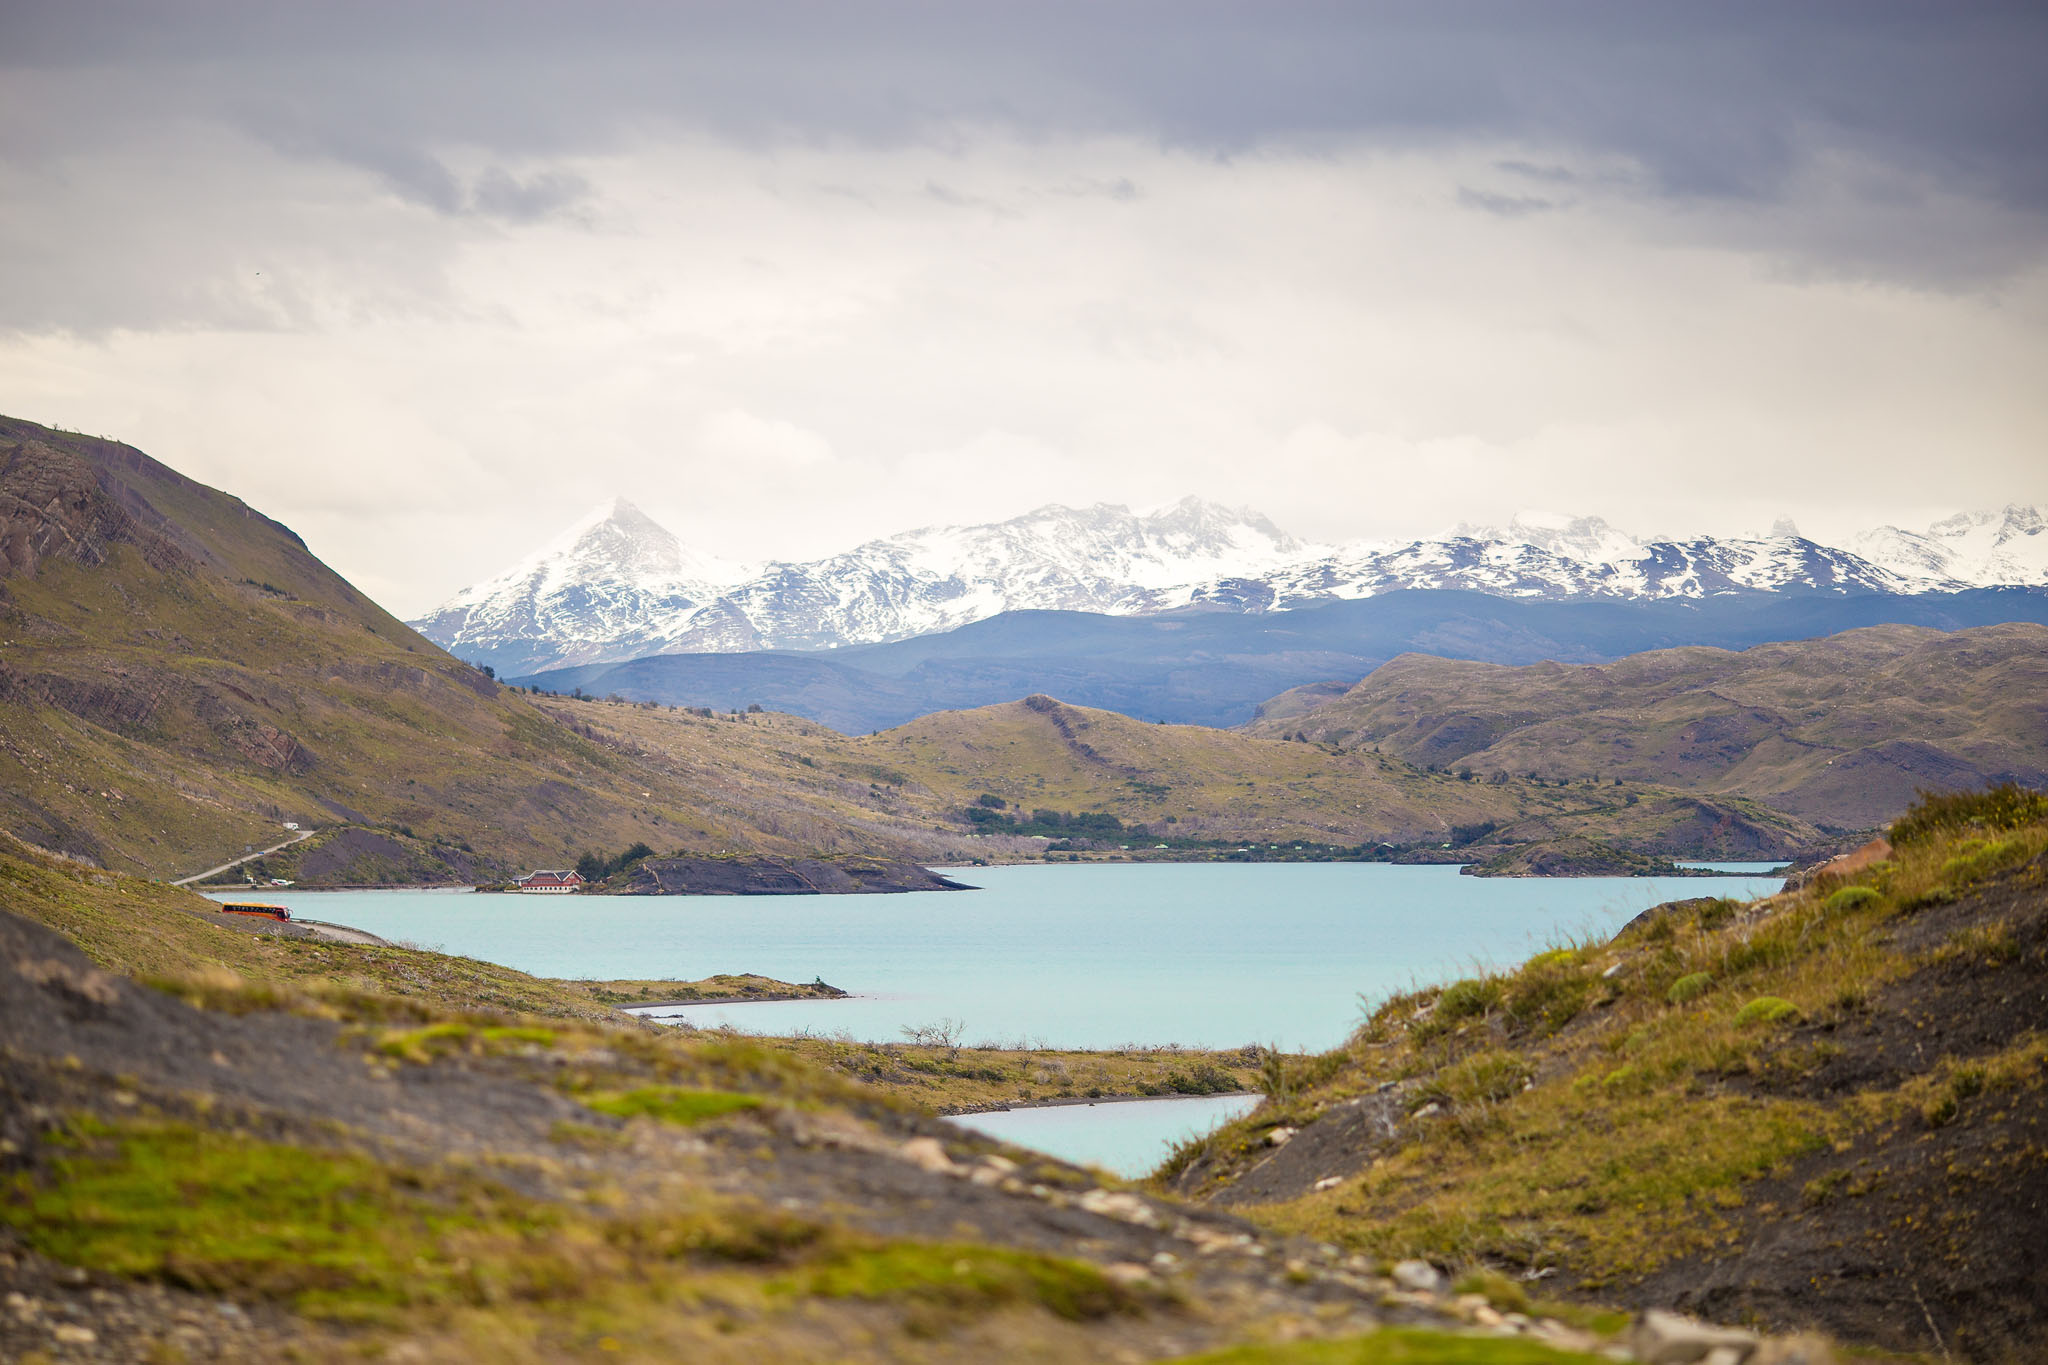 Wedding-Travellers-Overlanding-Destination-Wedding-Chile-Torres-del-Paine